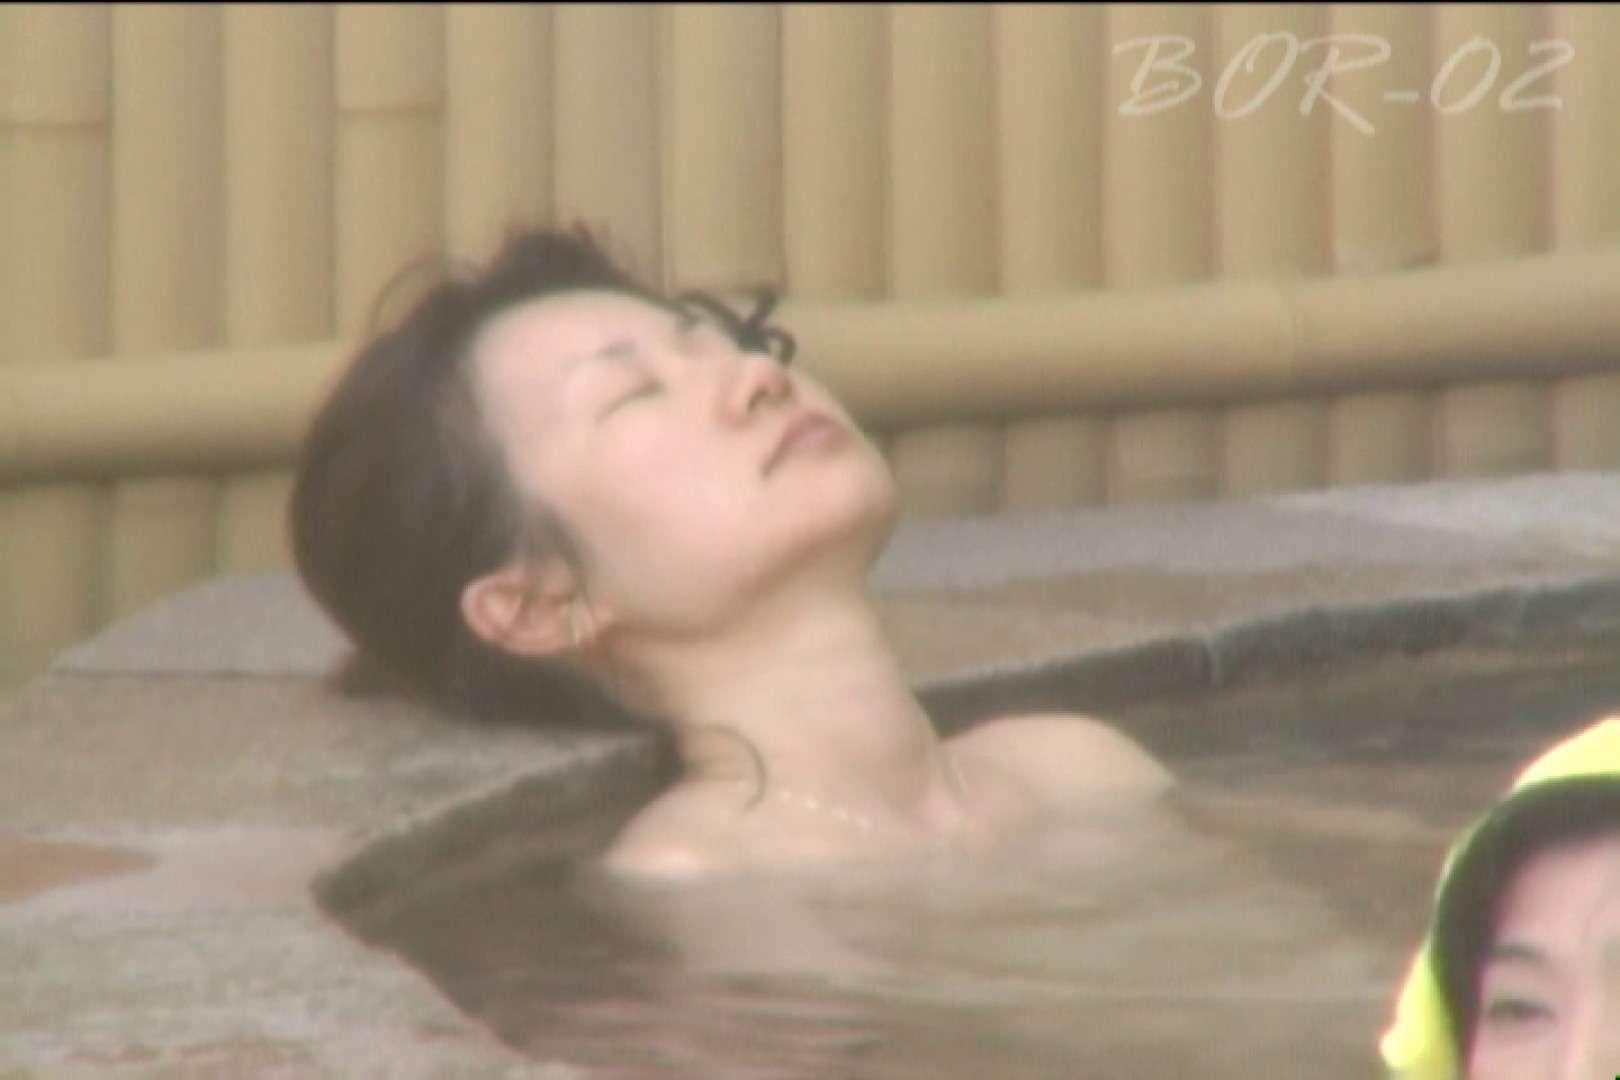 Aquaな露天風呂Vol.477 盗撮   OLエロ画像  99PICs 31